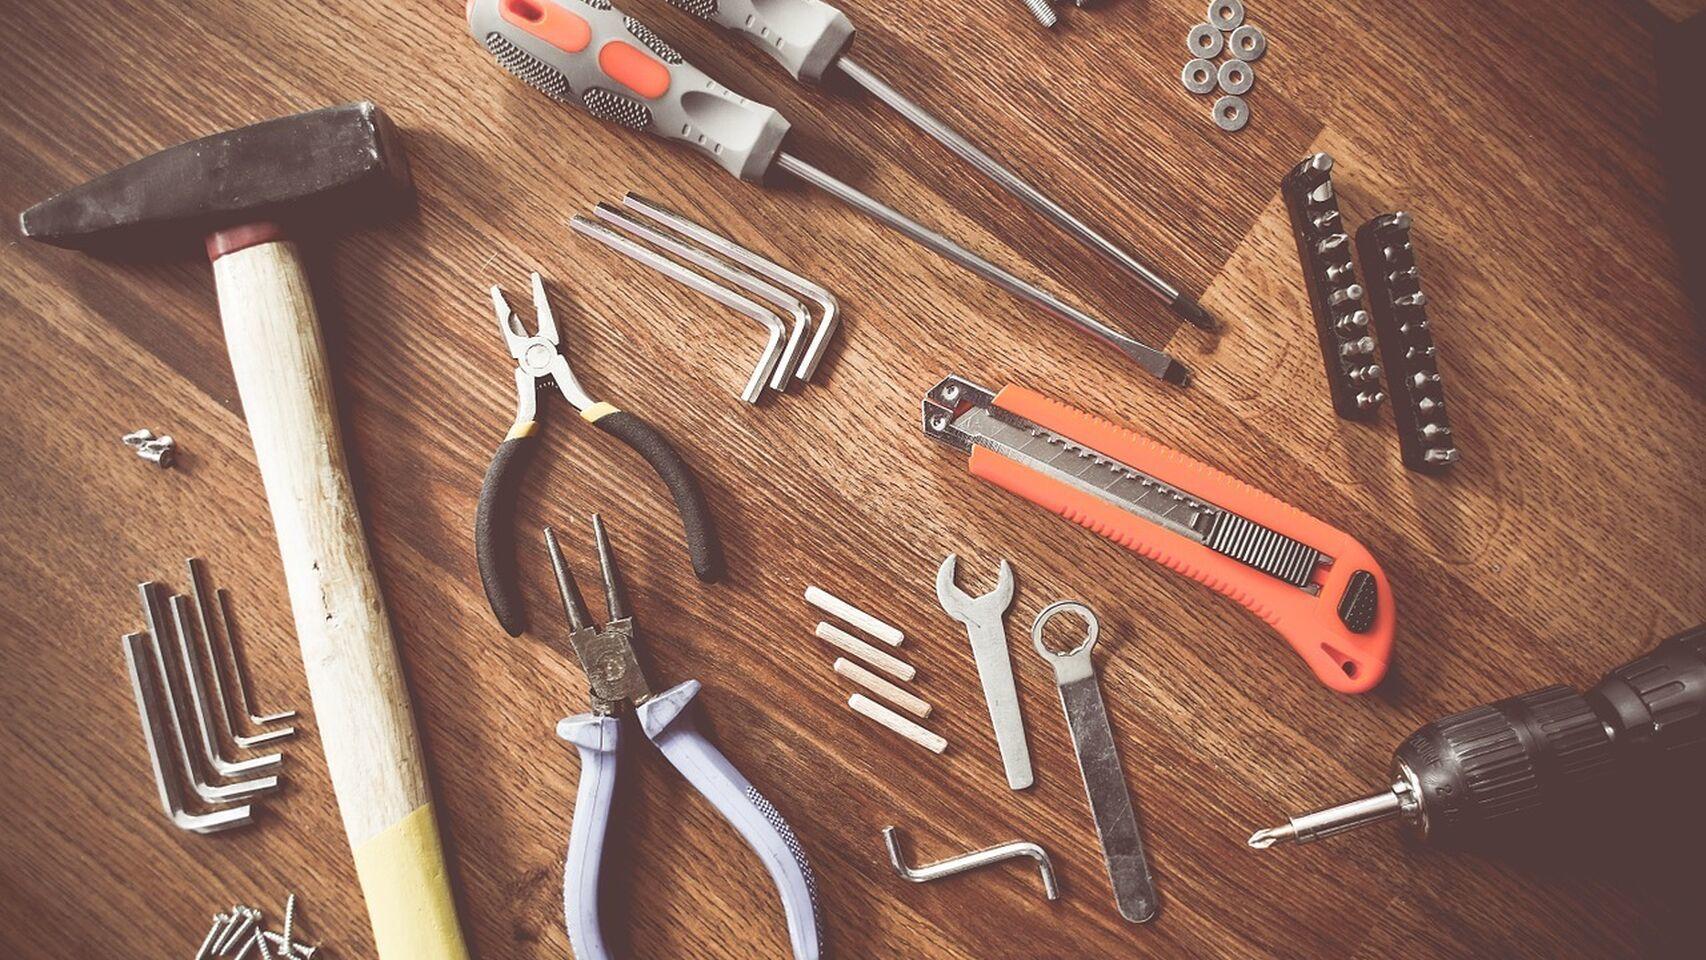 Varias herramientas